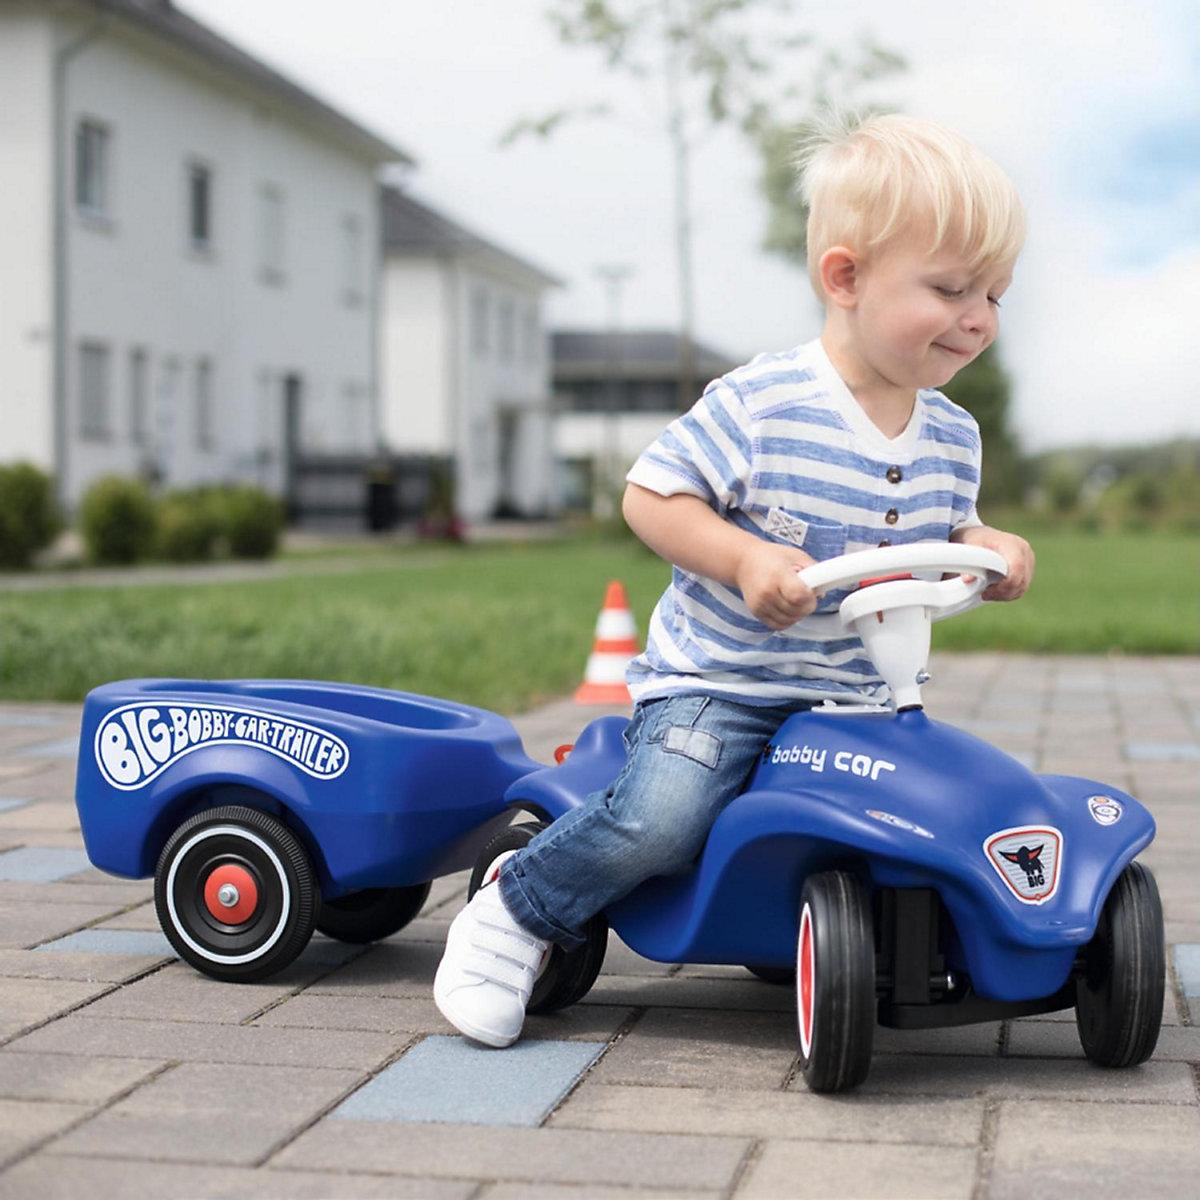 BIG-Bobby-Car-Trailer Royalblau BIG bE57t